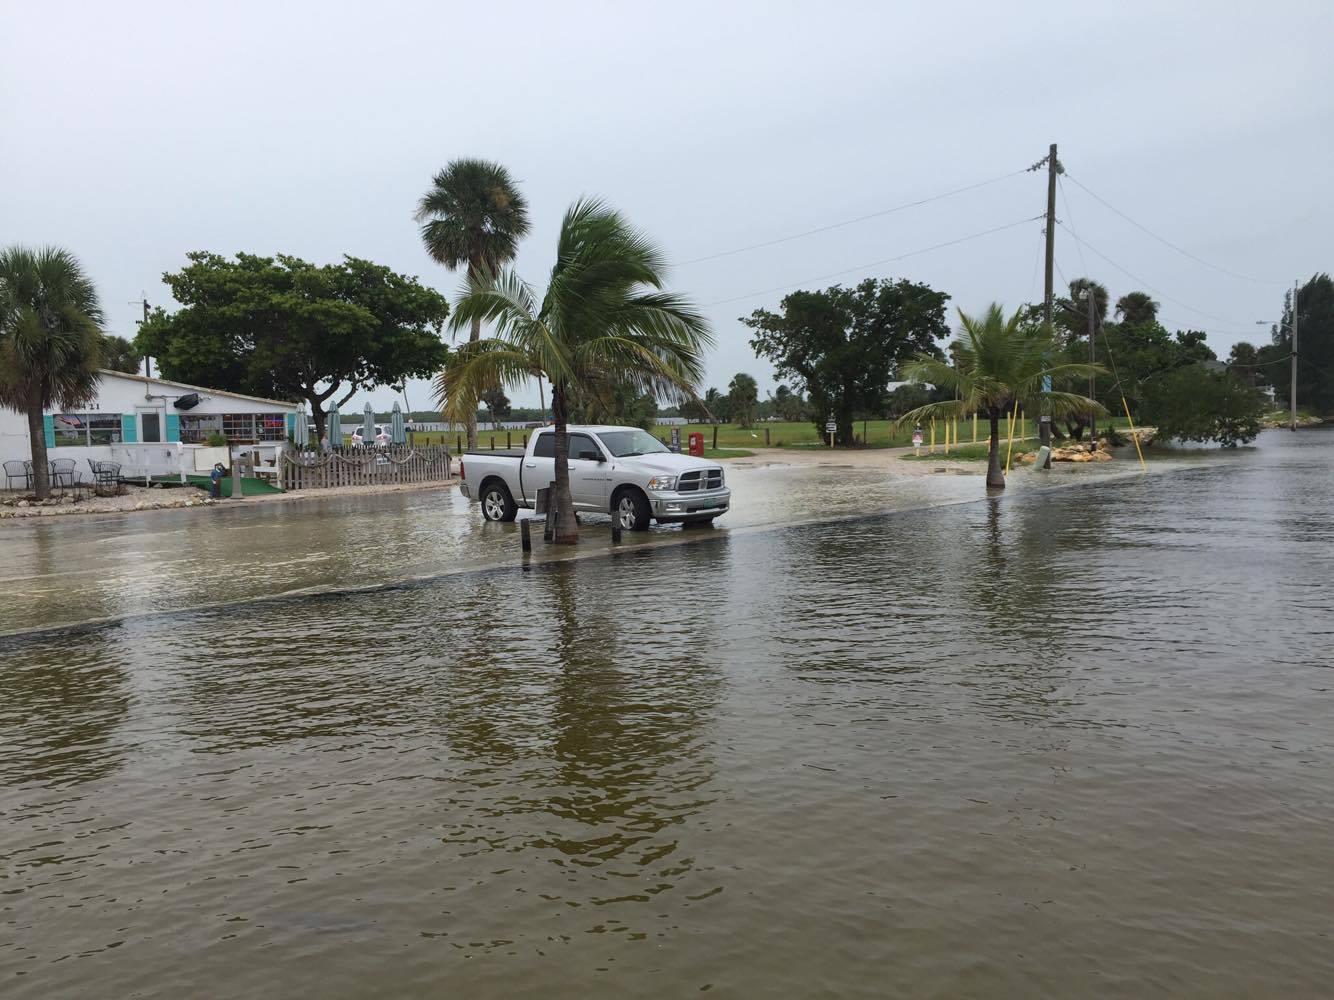 Island Pines Fort Myers Beach